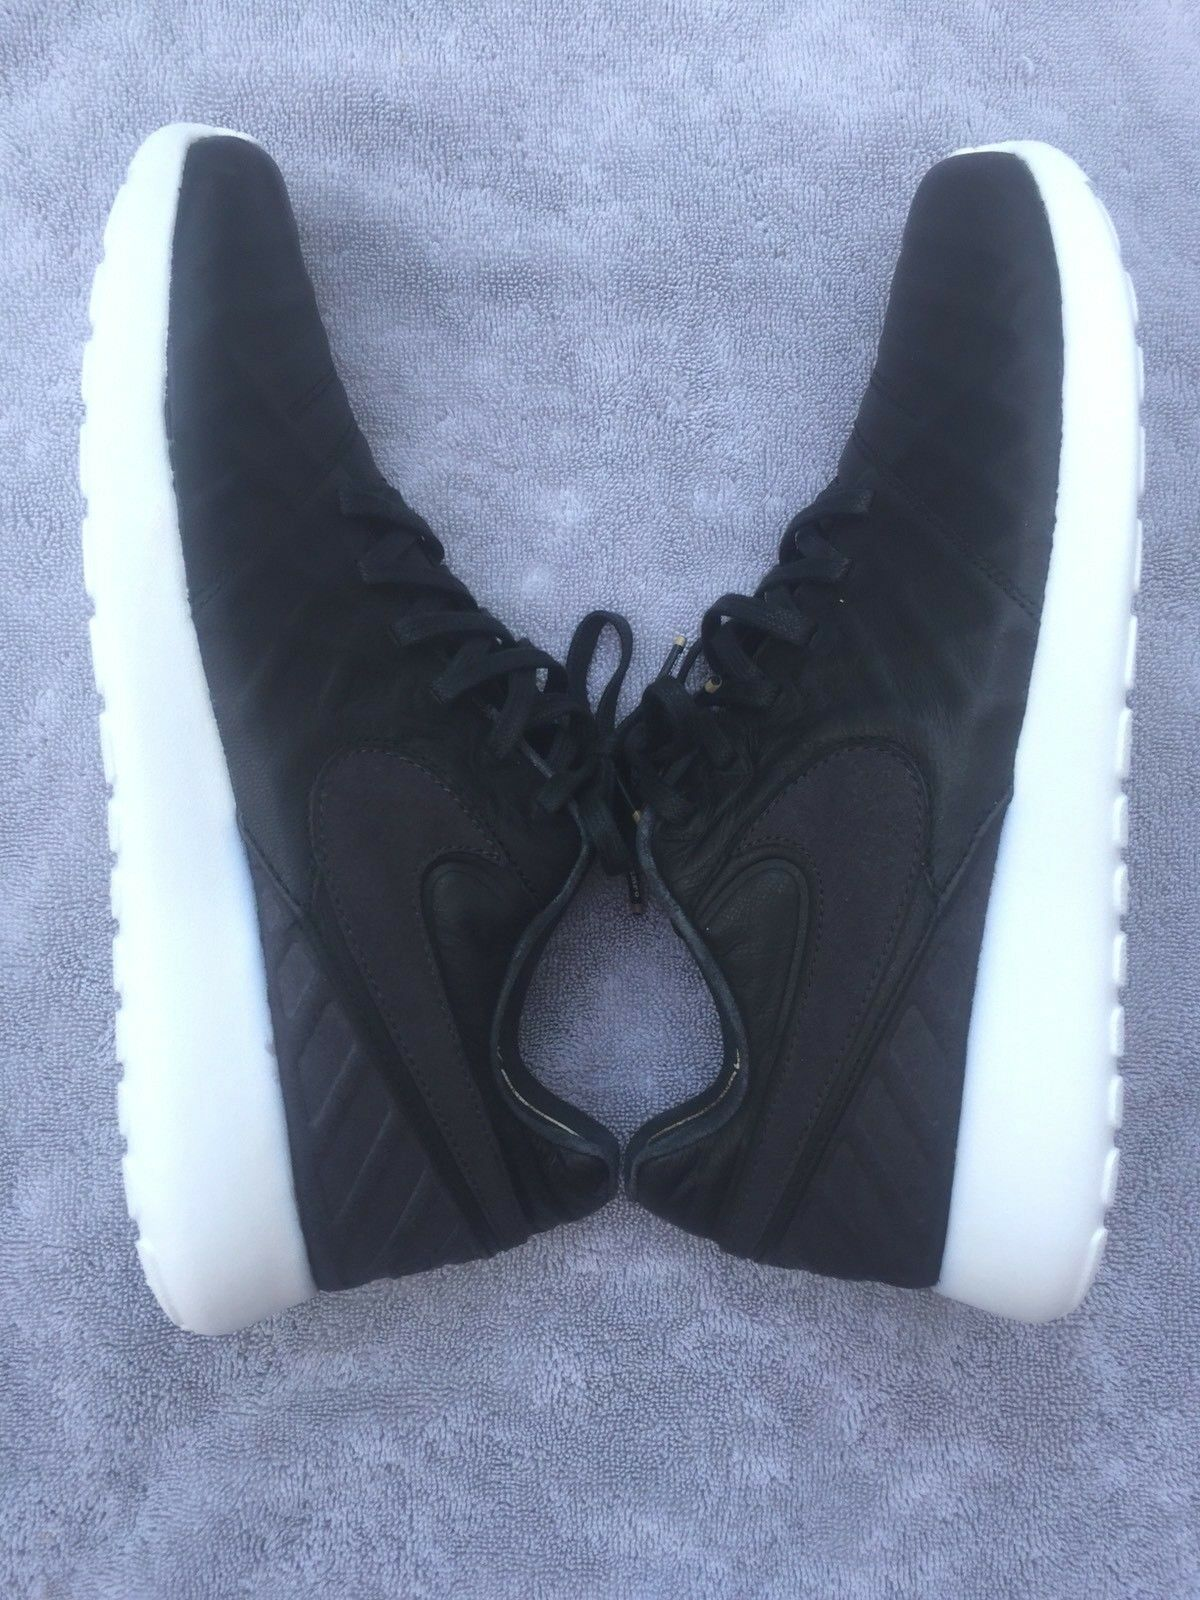 Nike Roshe Tiempo VI QS 853535-002 Black Leather Futbol Soccer shoes Men's Sz 10